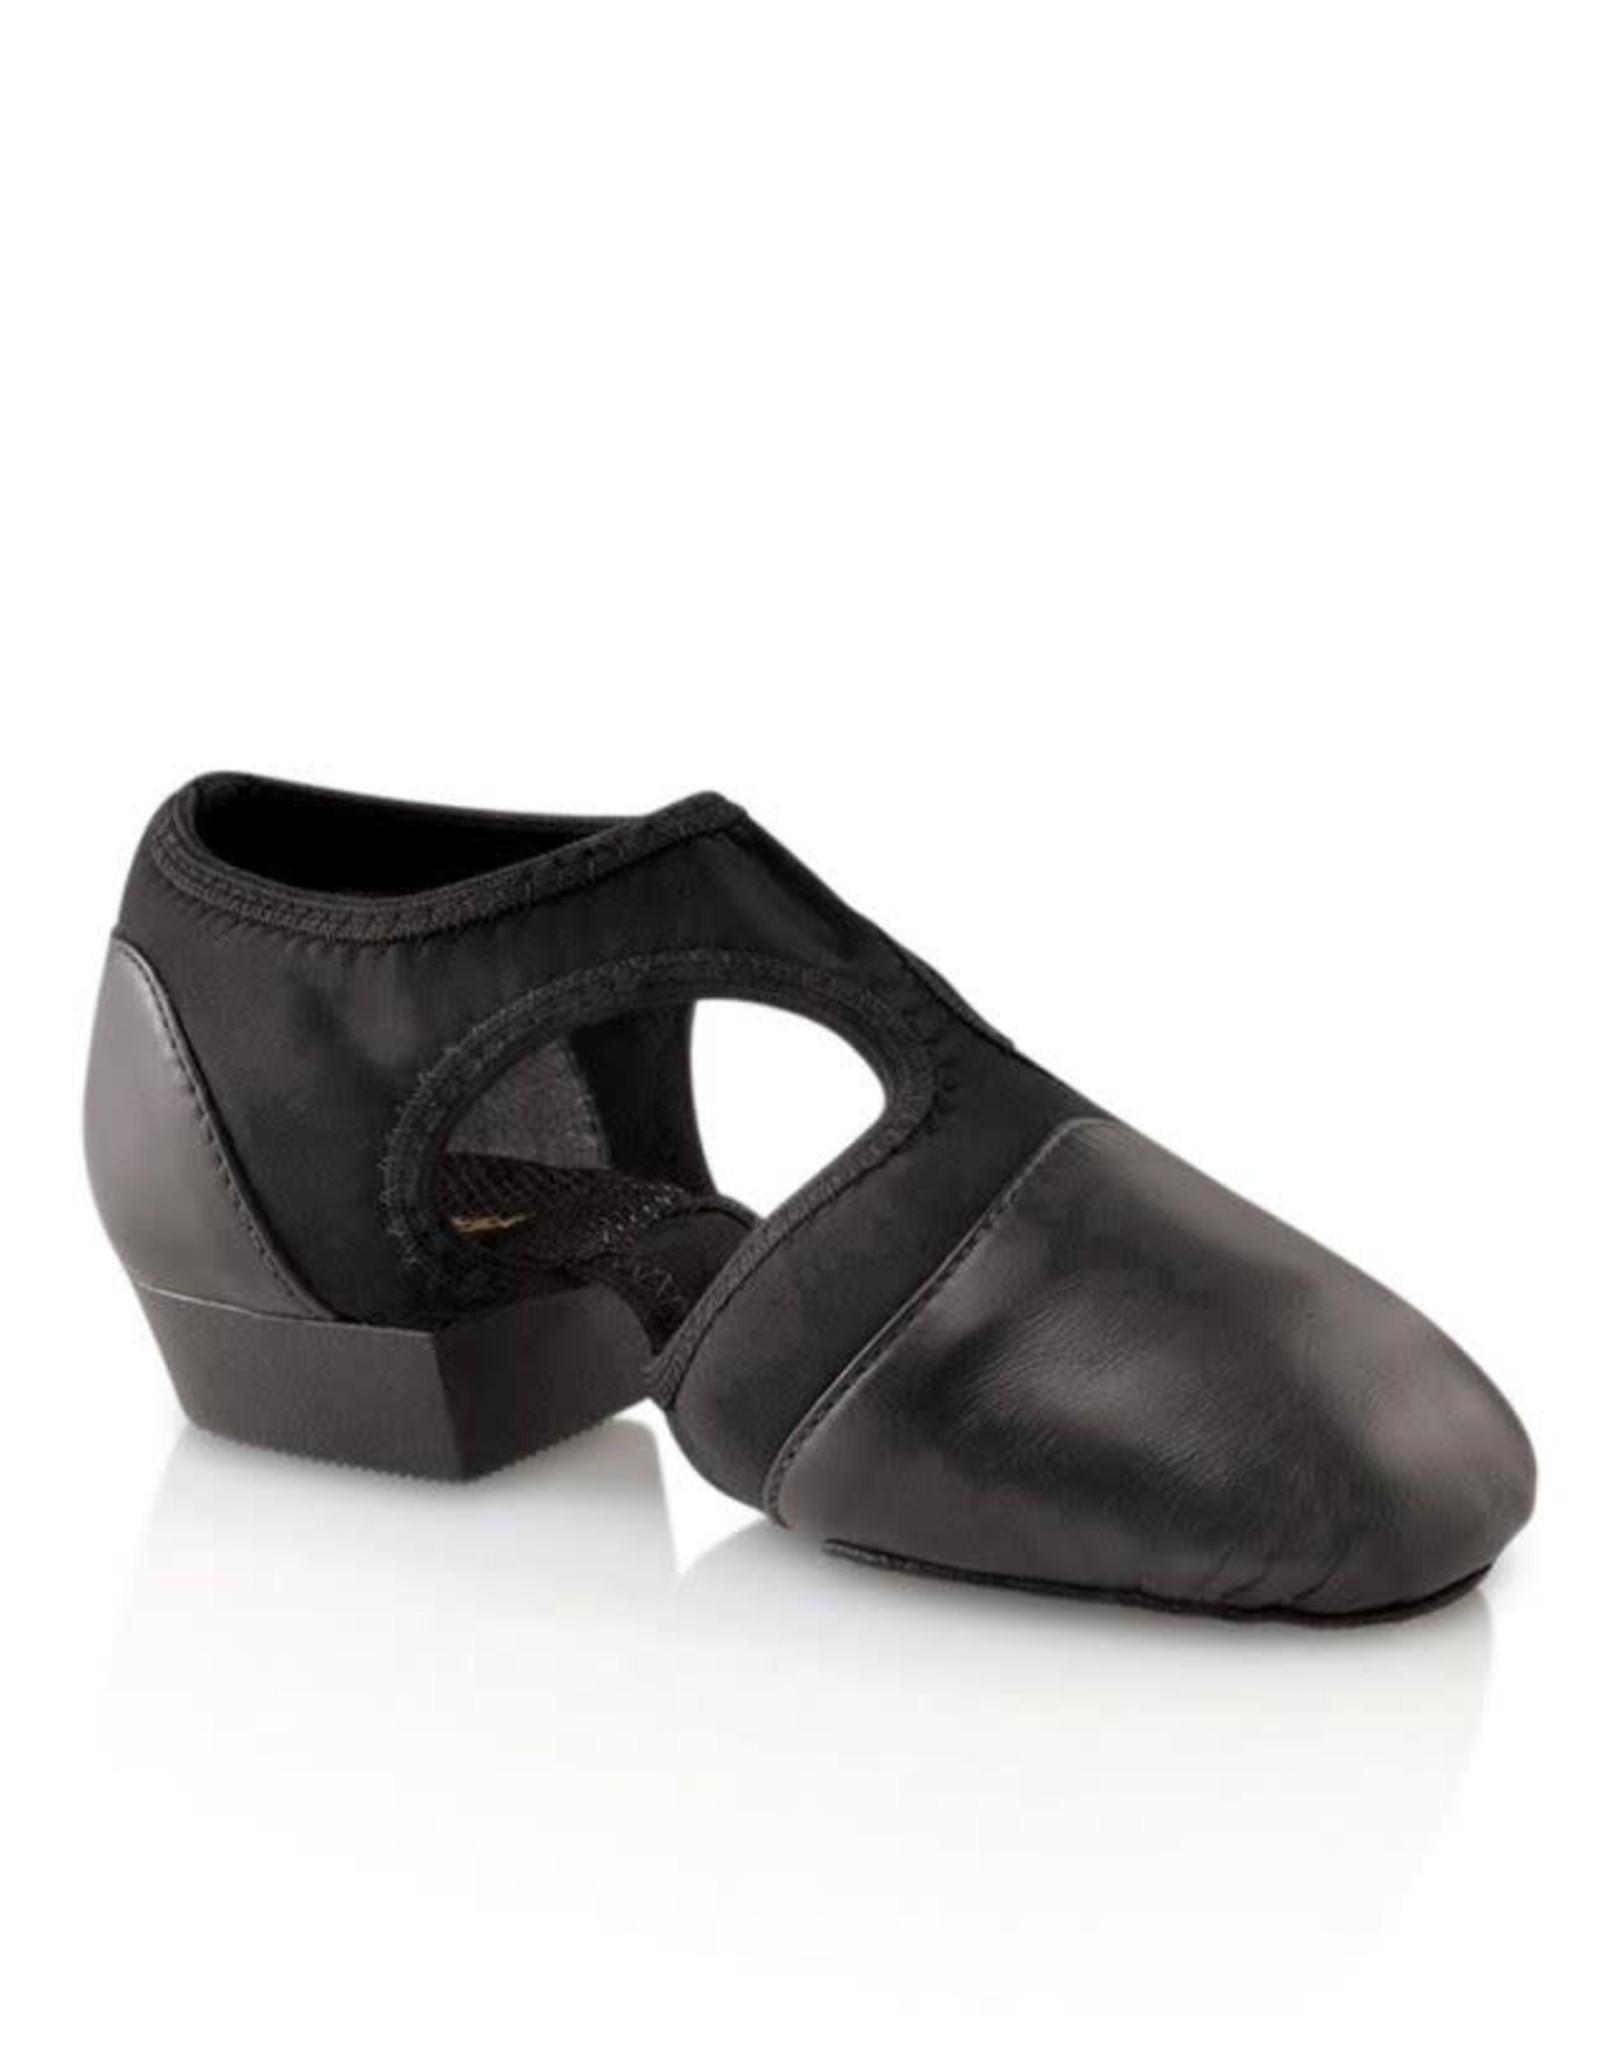 Capezio PP323 Pedini Jazz Shoe BLACK